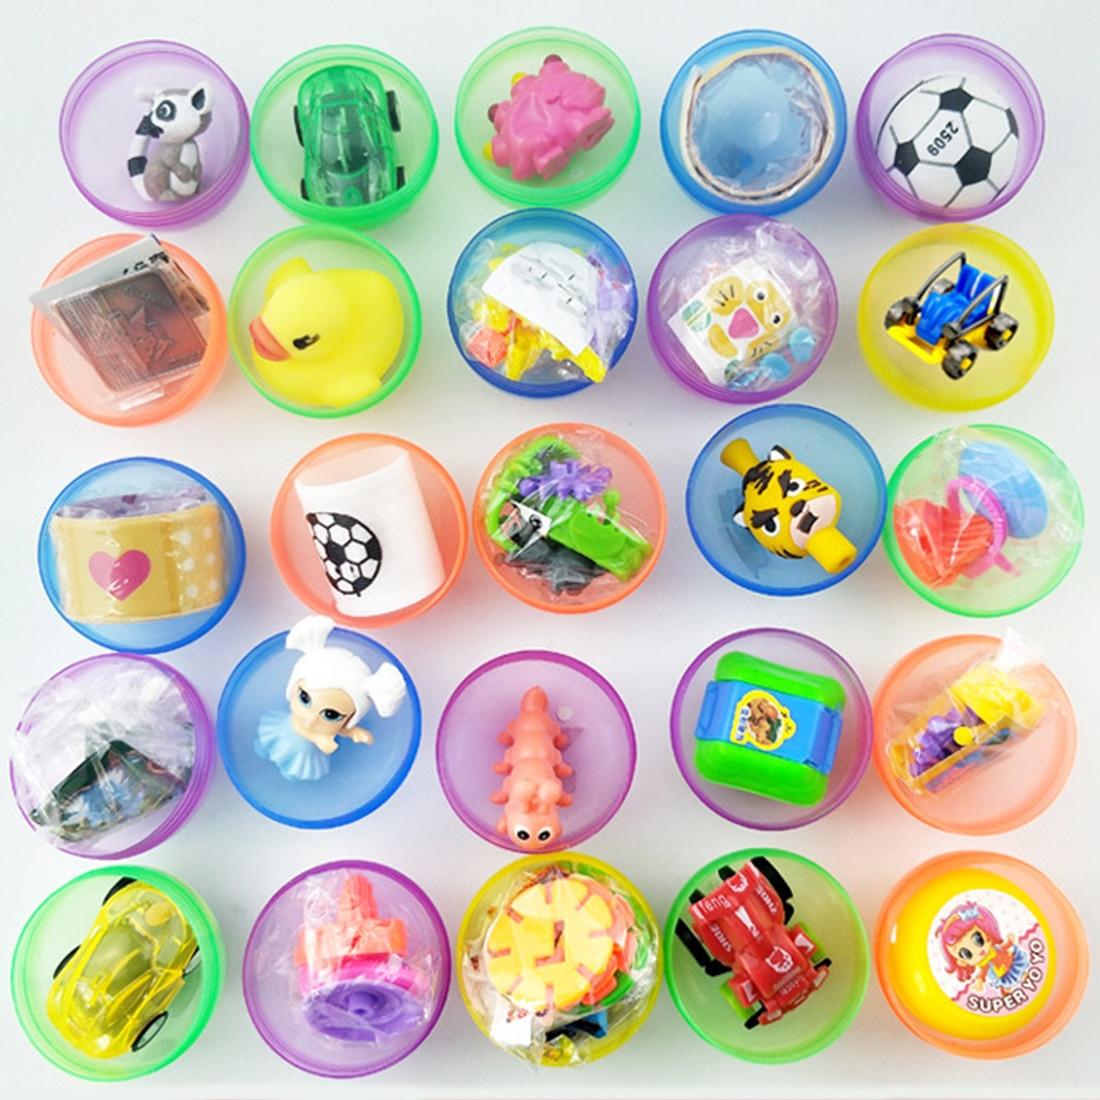 100Pcs 5cm Filled Easter Eggs Plastic Surprise Party Eggs For Easter Hunt - Random